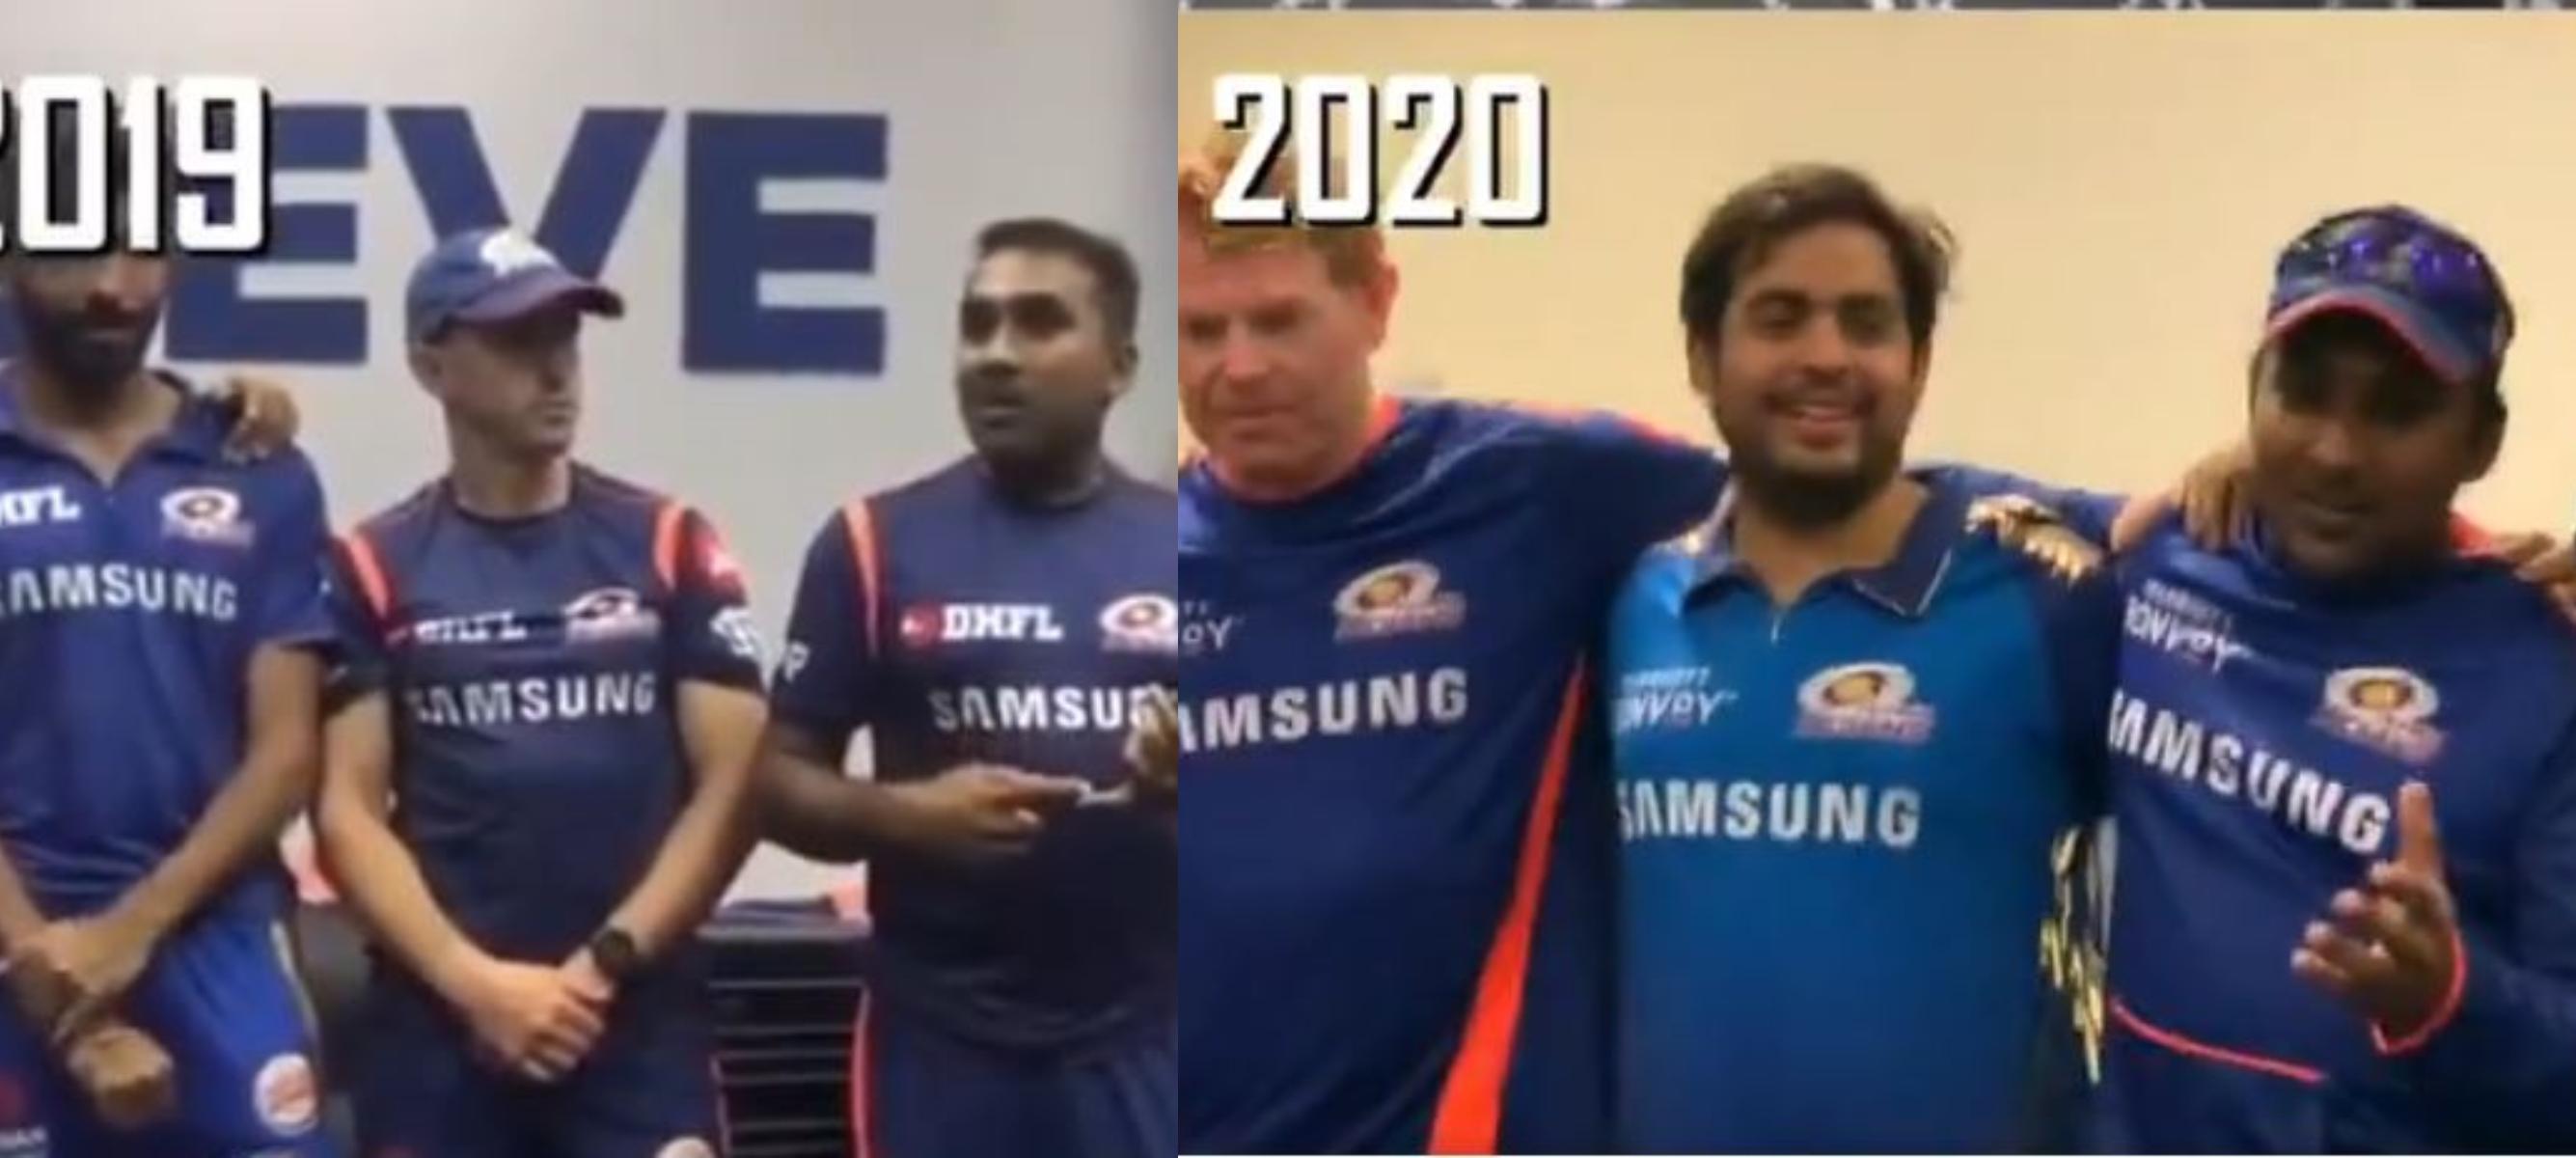 MI won their third IPL title with Mahela Jayawardena as their head coach | MI Twitter